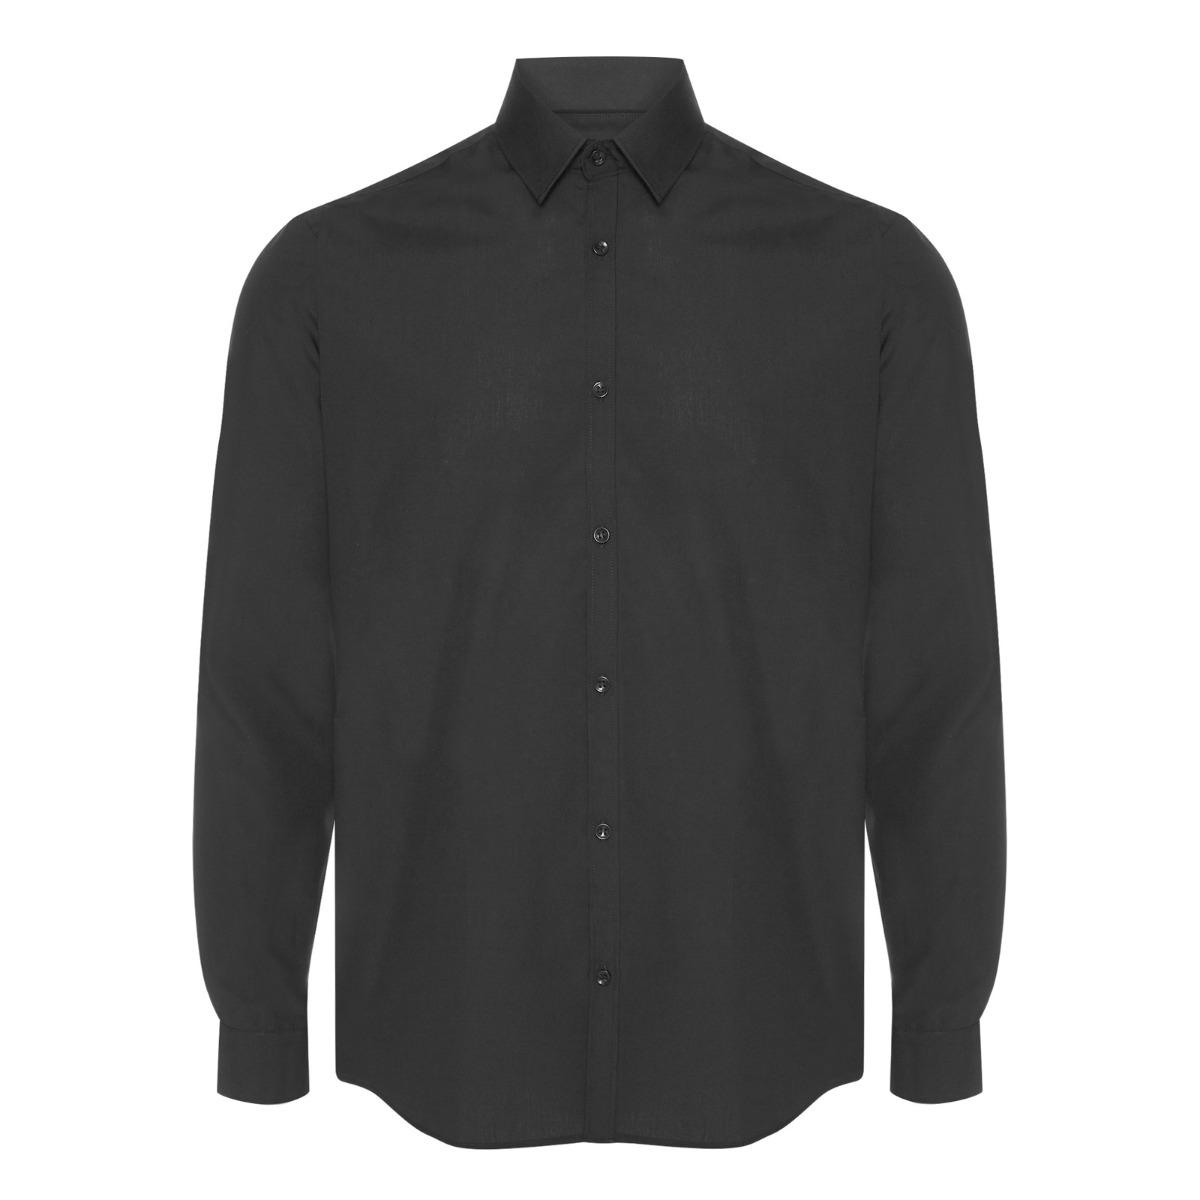 Mens-Black-Formal-Shirt-Long-Sleeve-Regular-Fit-Plain-Business-Work-Collar-Smart thumbnail 7